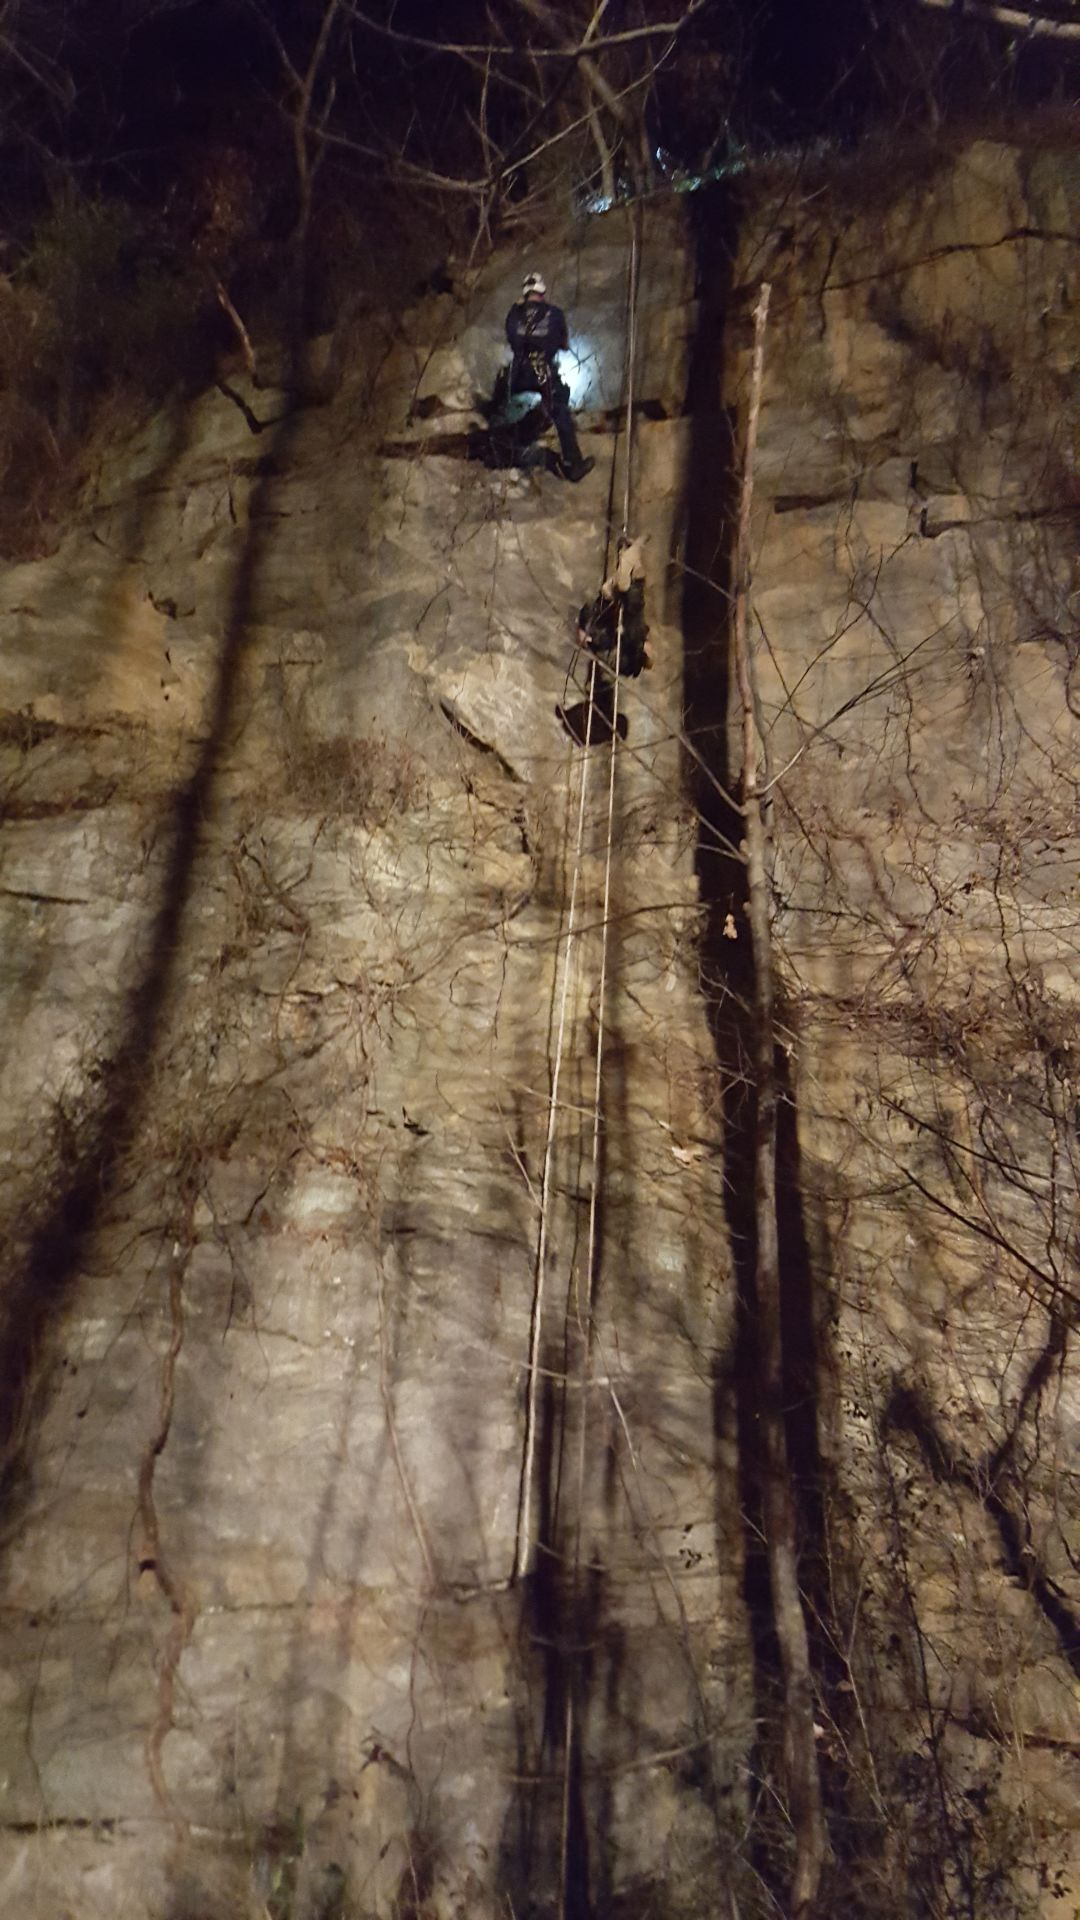 Stuck rock climber rescued | News | themountaineer.com